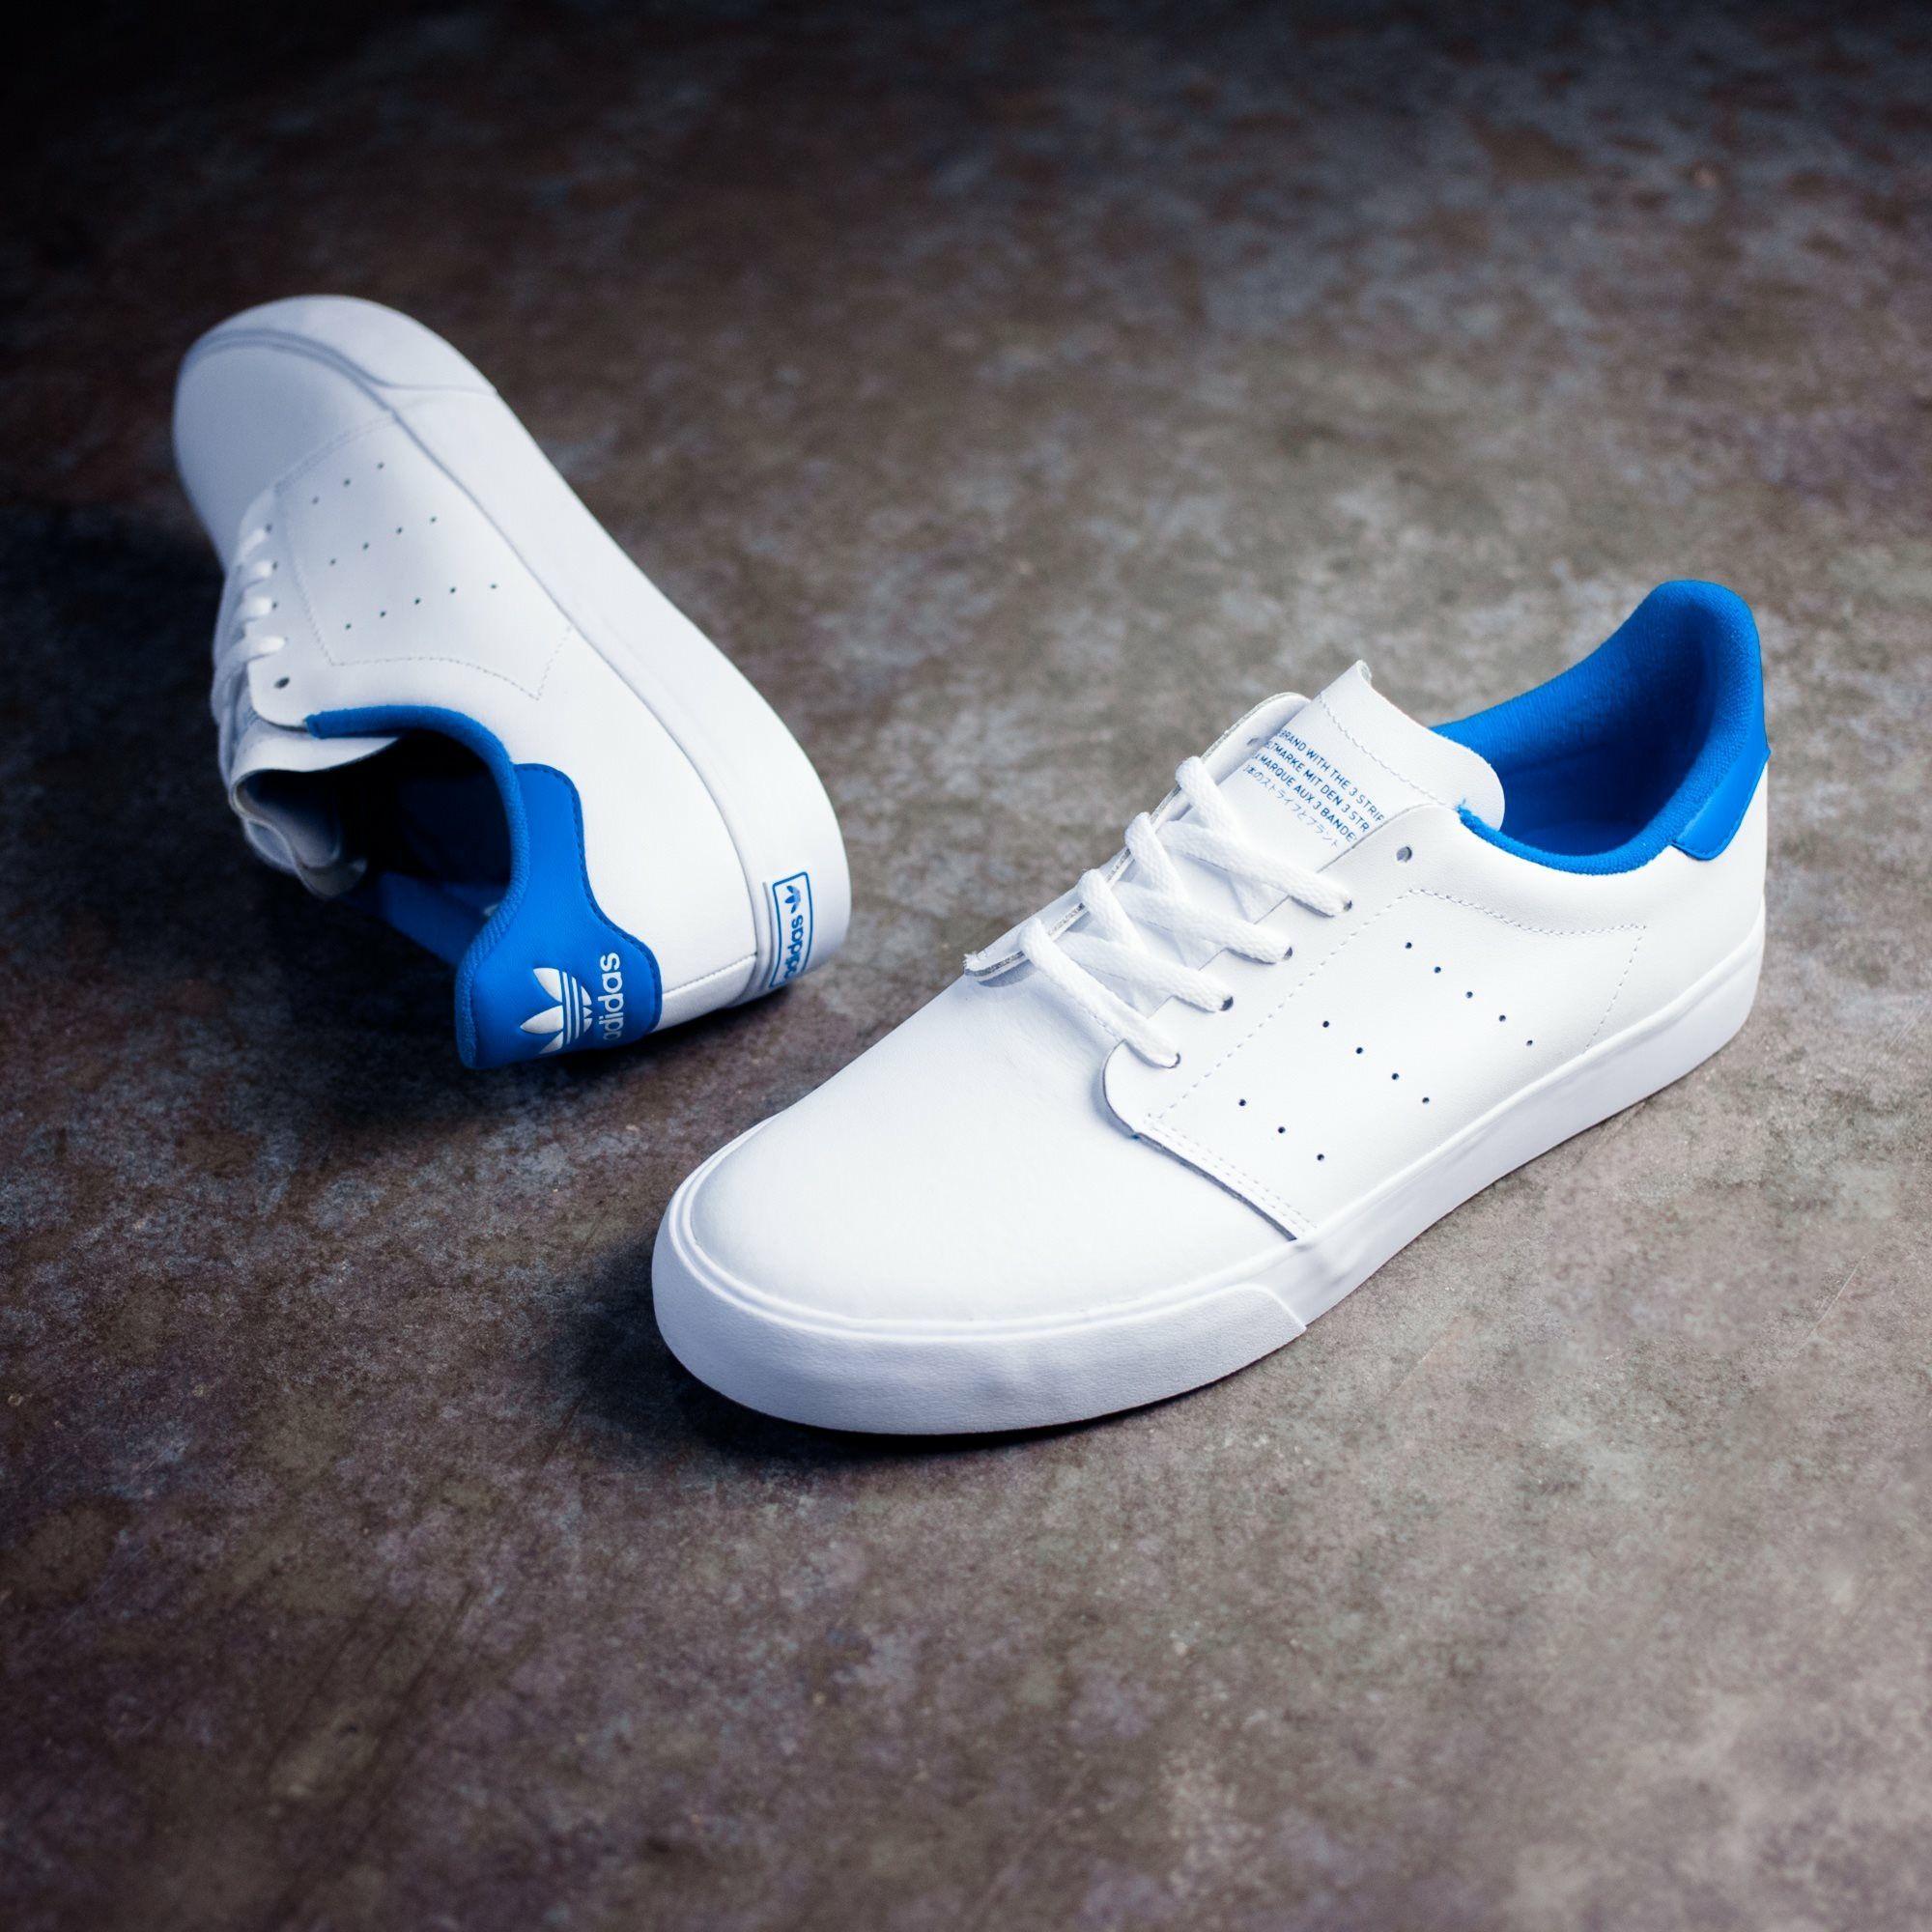 Adidas Originals Seeley Court zapatillas: Adidas Skateboarding